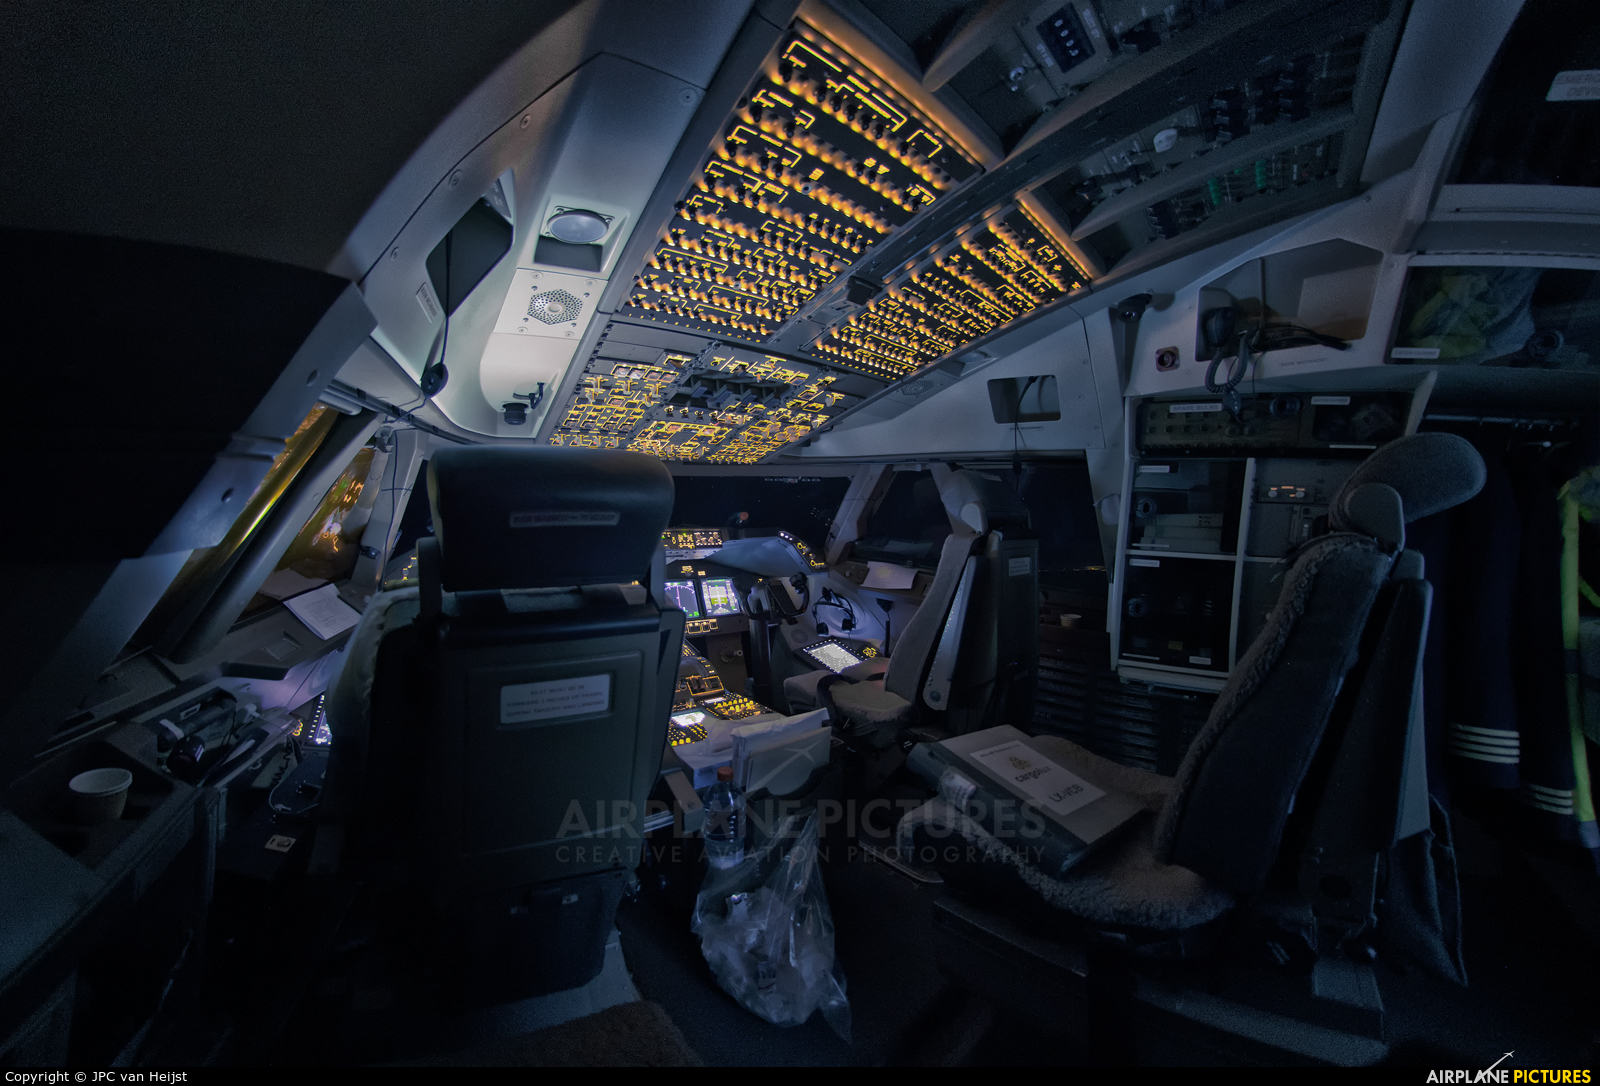 Cargolux LX-VCB aircraft at In Flight - International